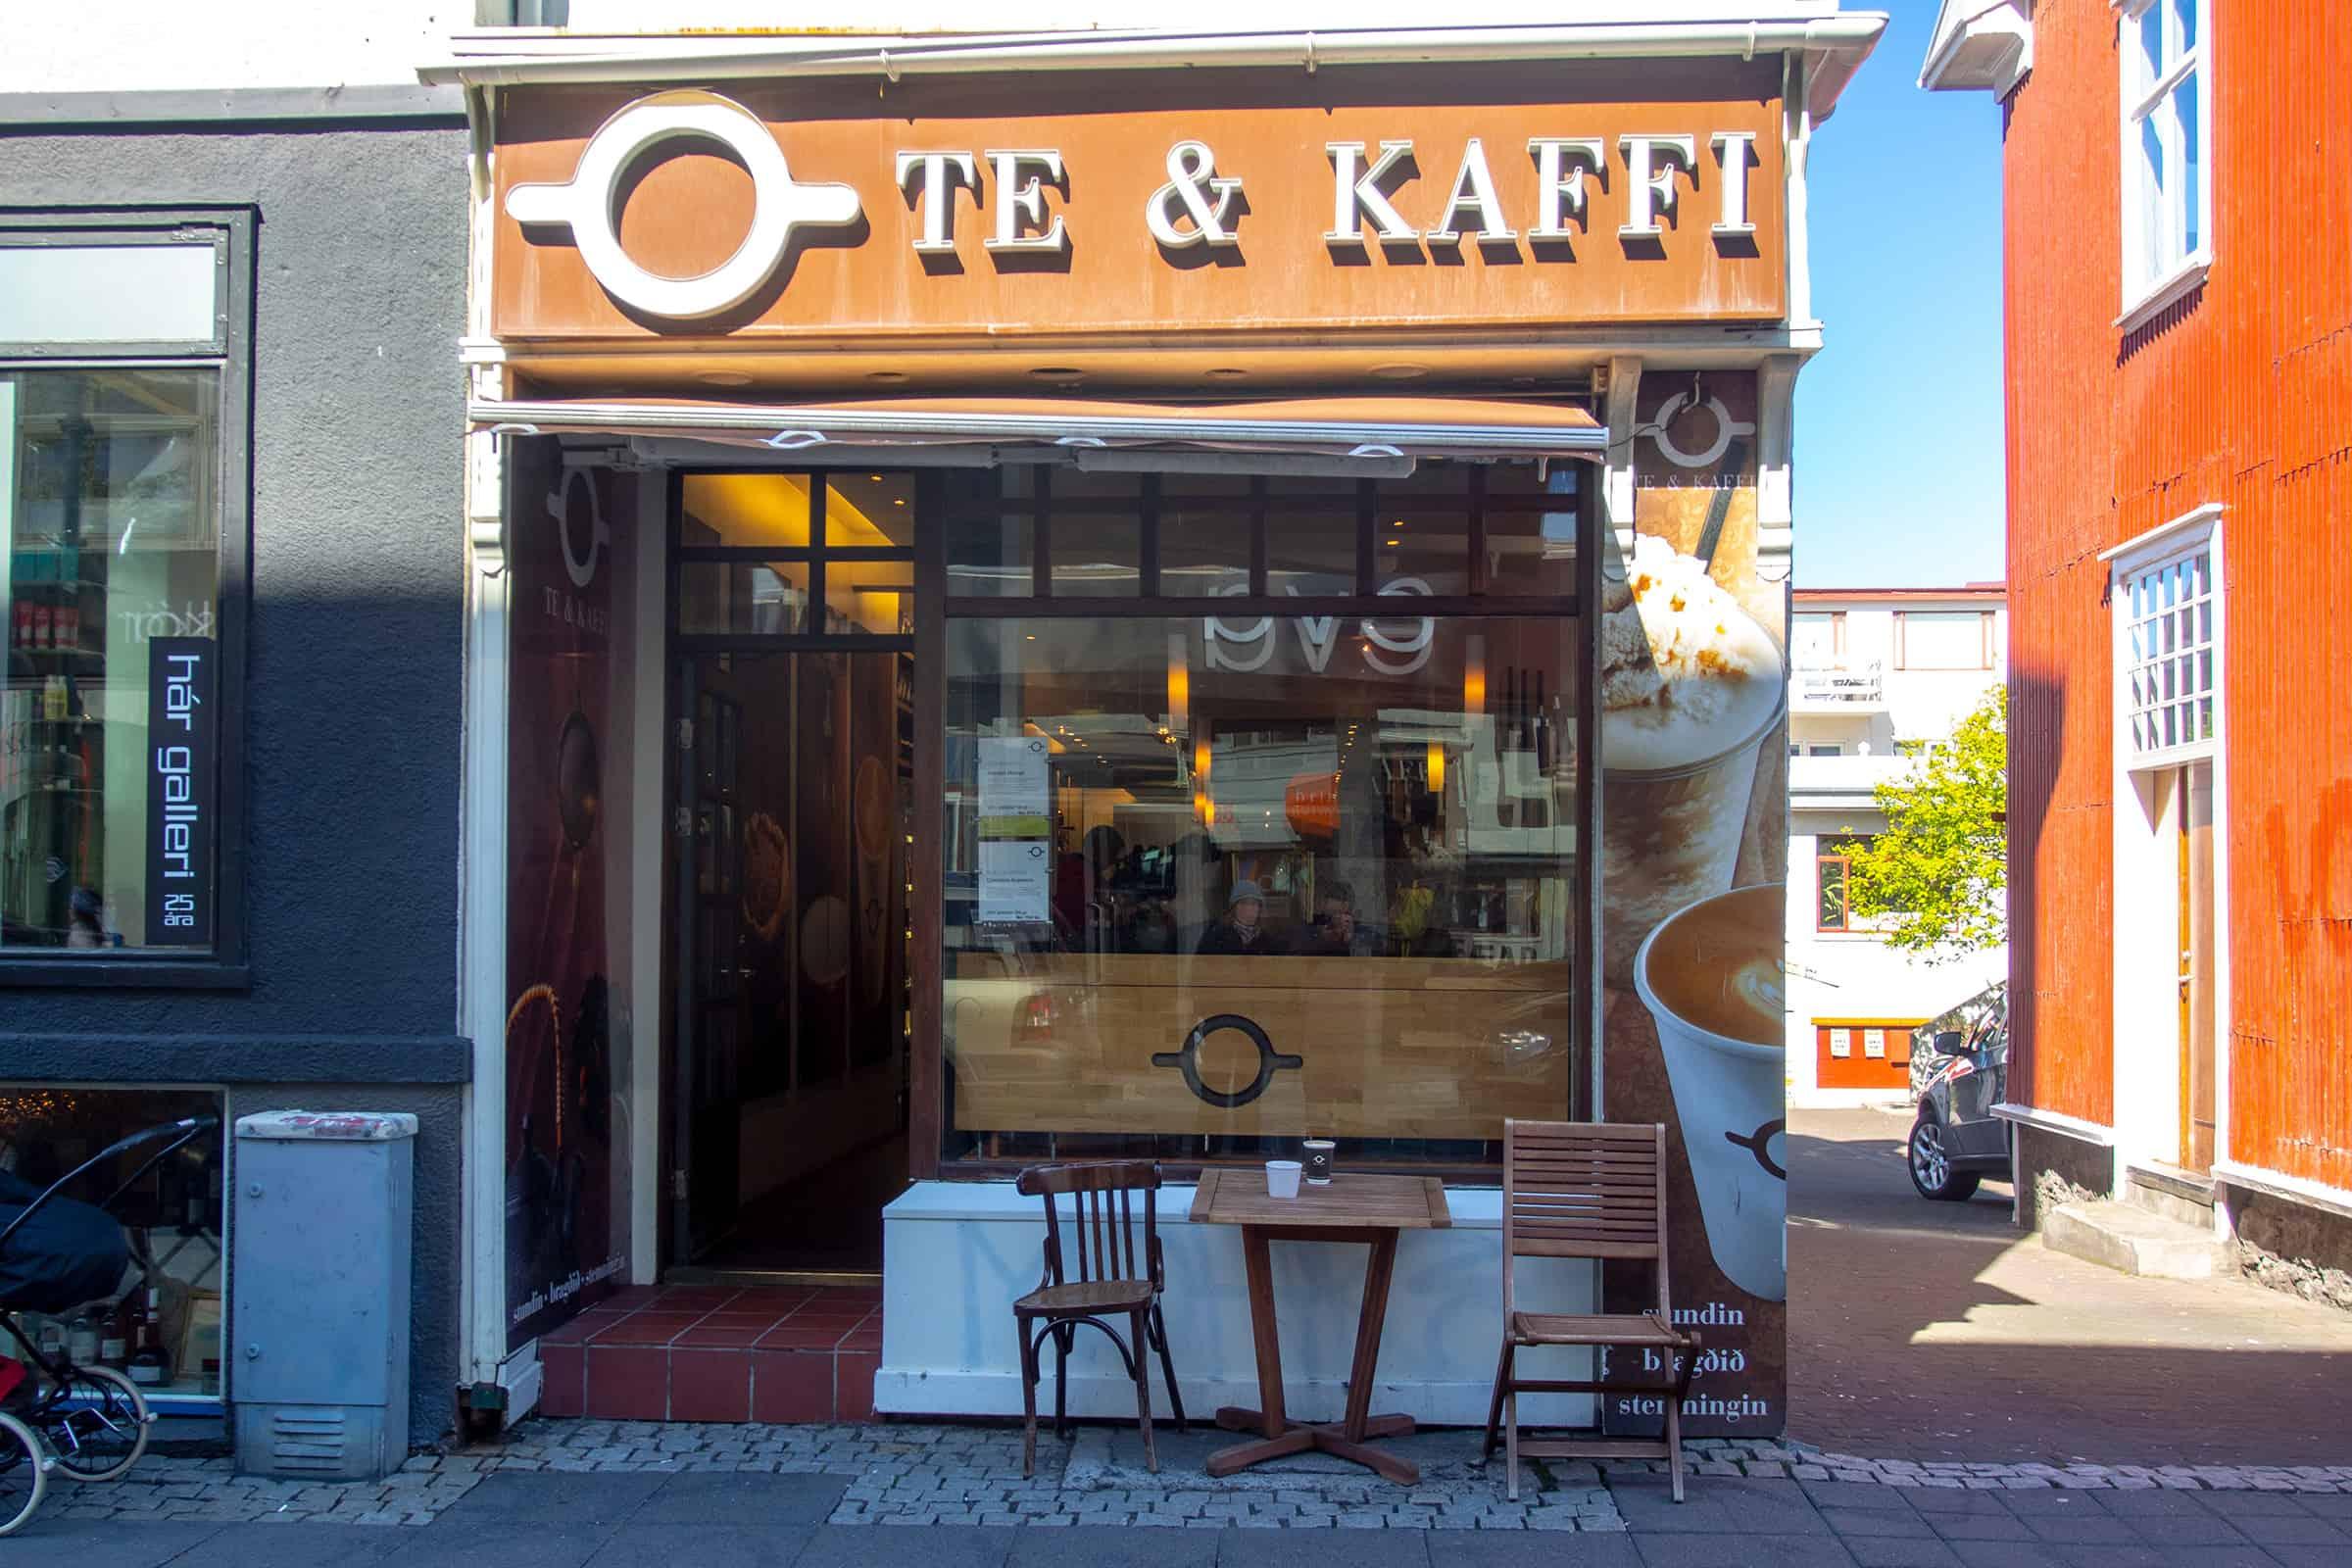 Te & Kaffi